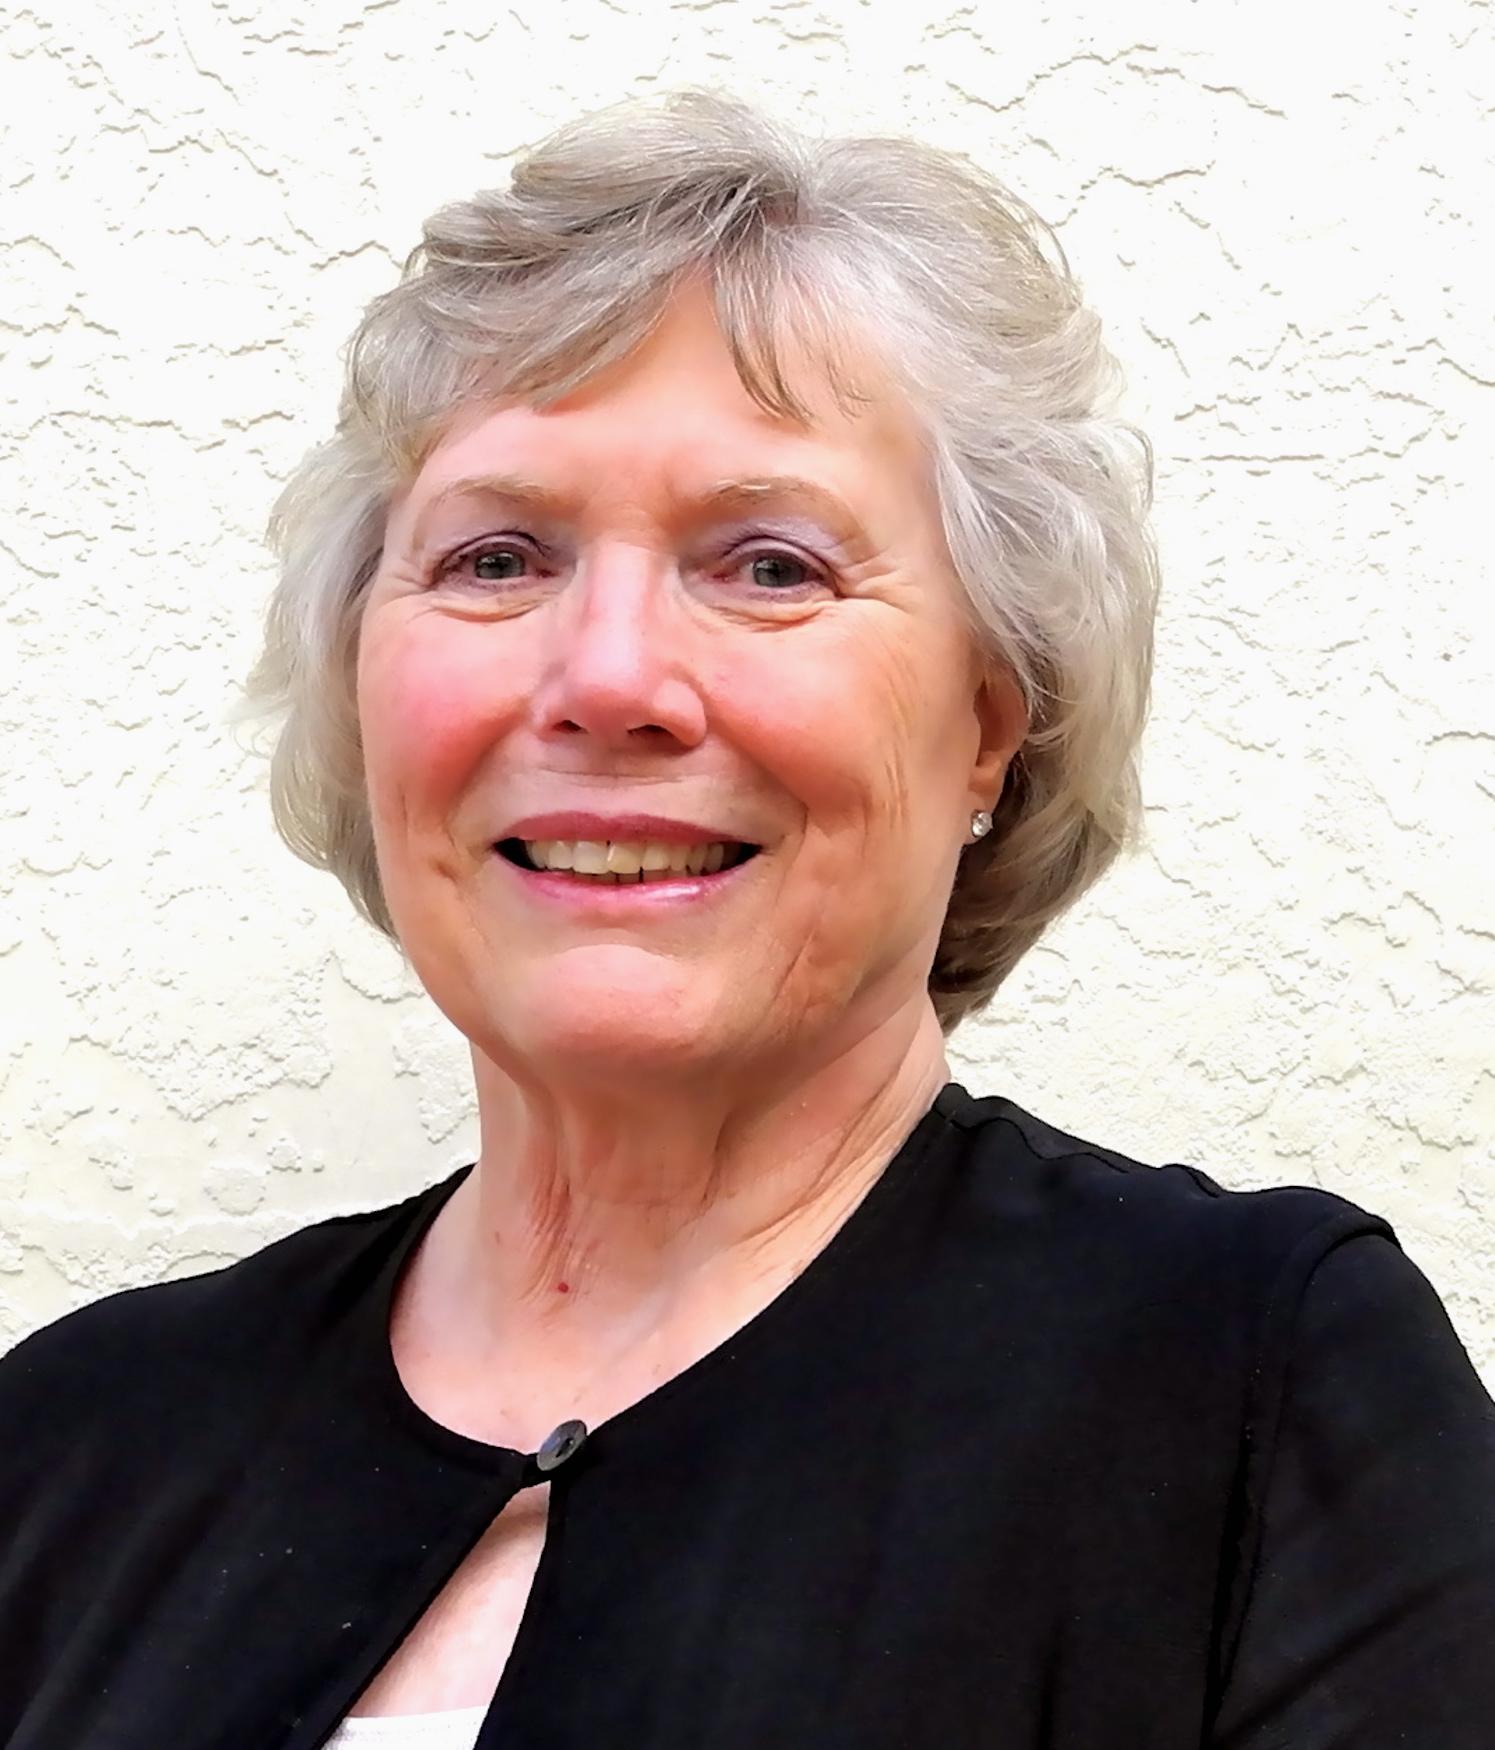 Carole J. Greene, President